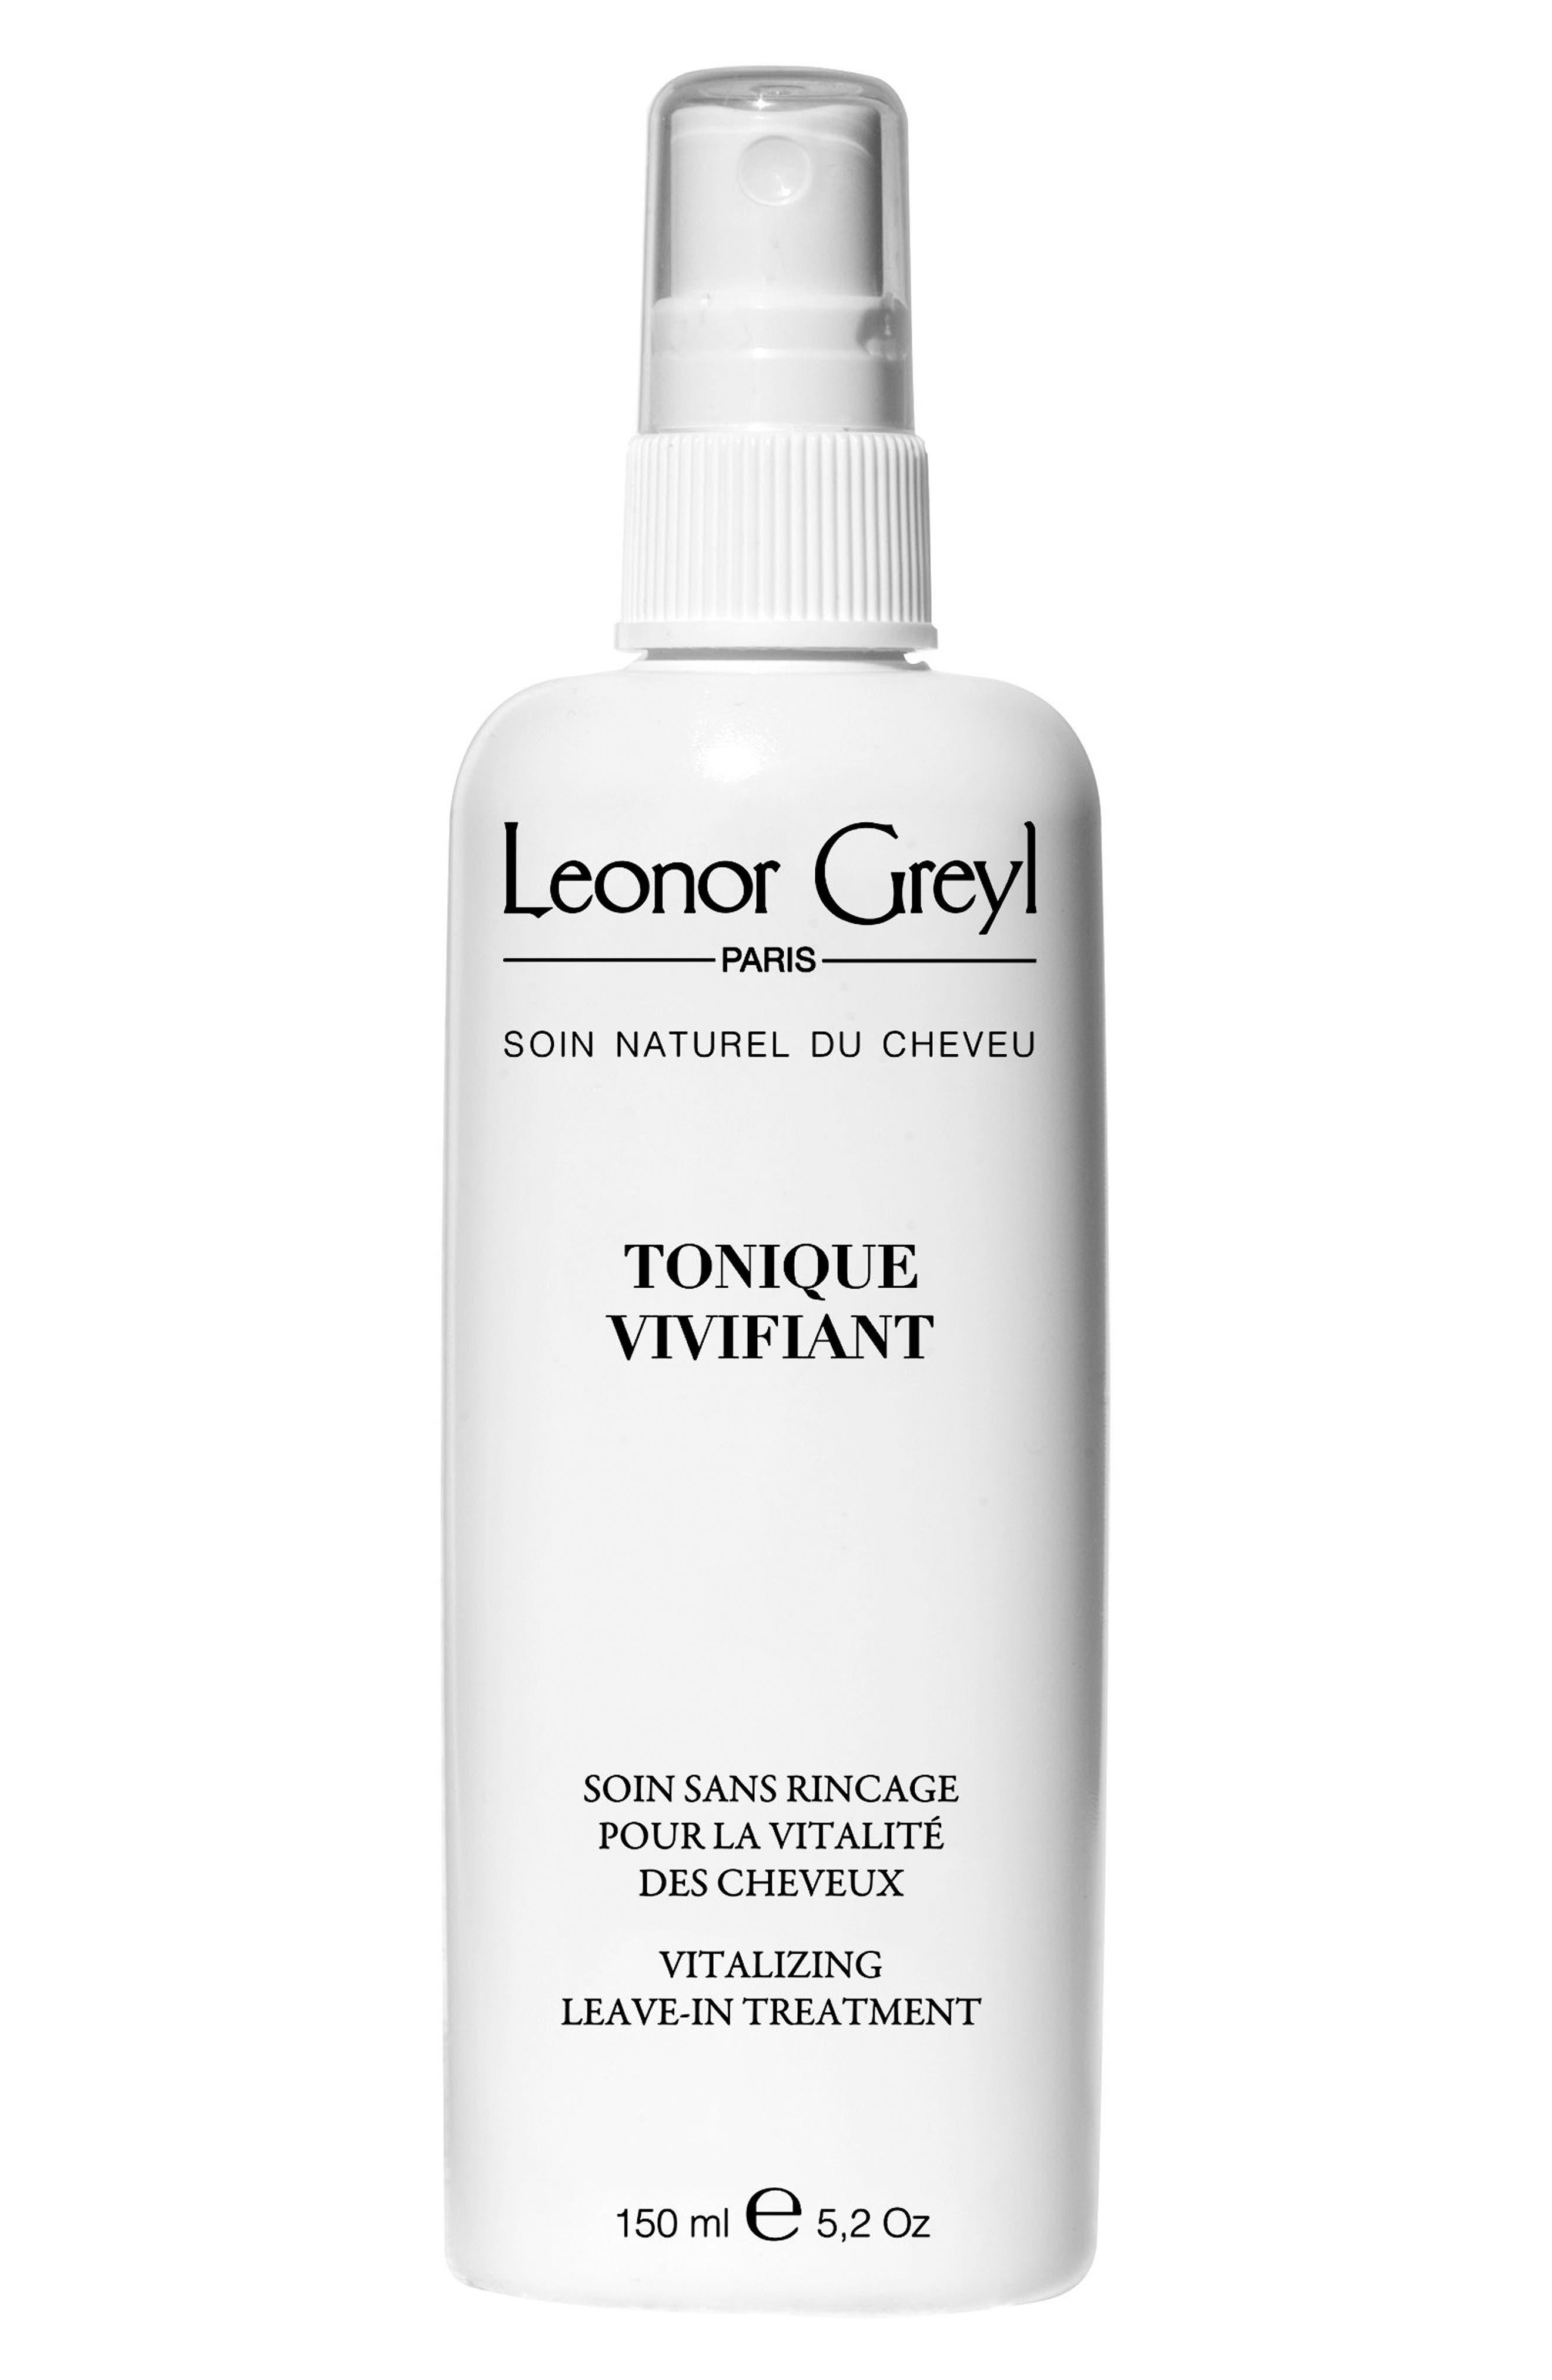 Leonor Greyl PARIS 'Tonique Vivifiant' Leave-In Treatment